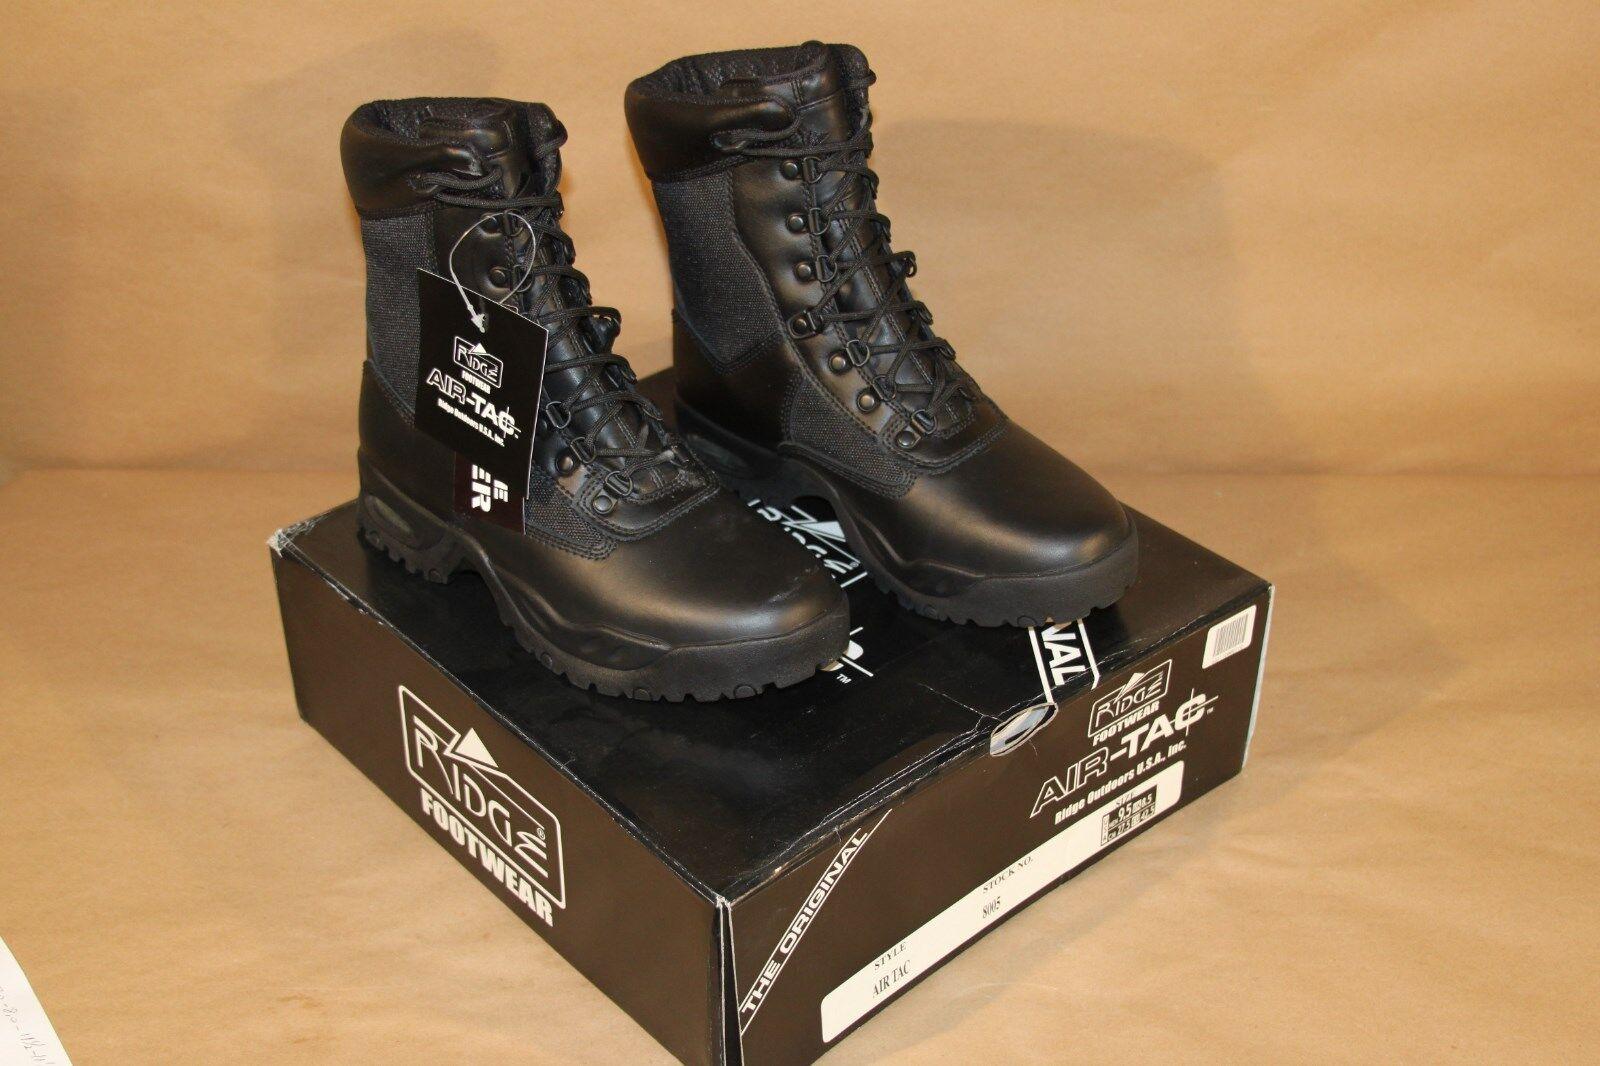 Ridge Footwear Air-Tac 8005 Tactical boots